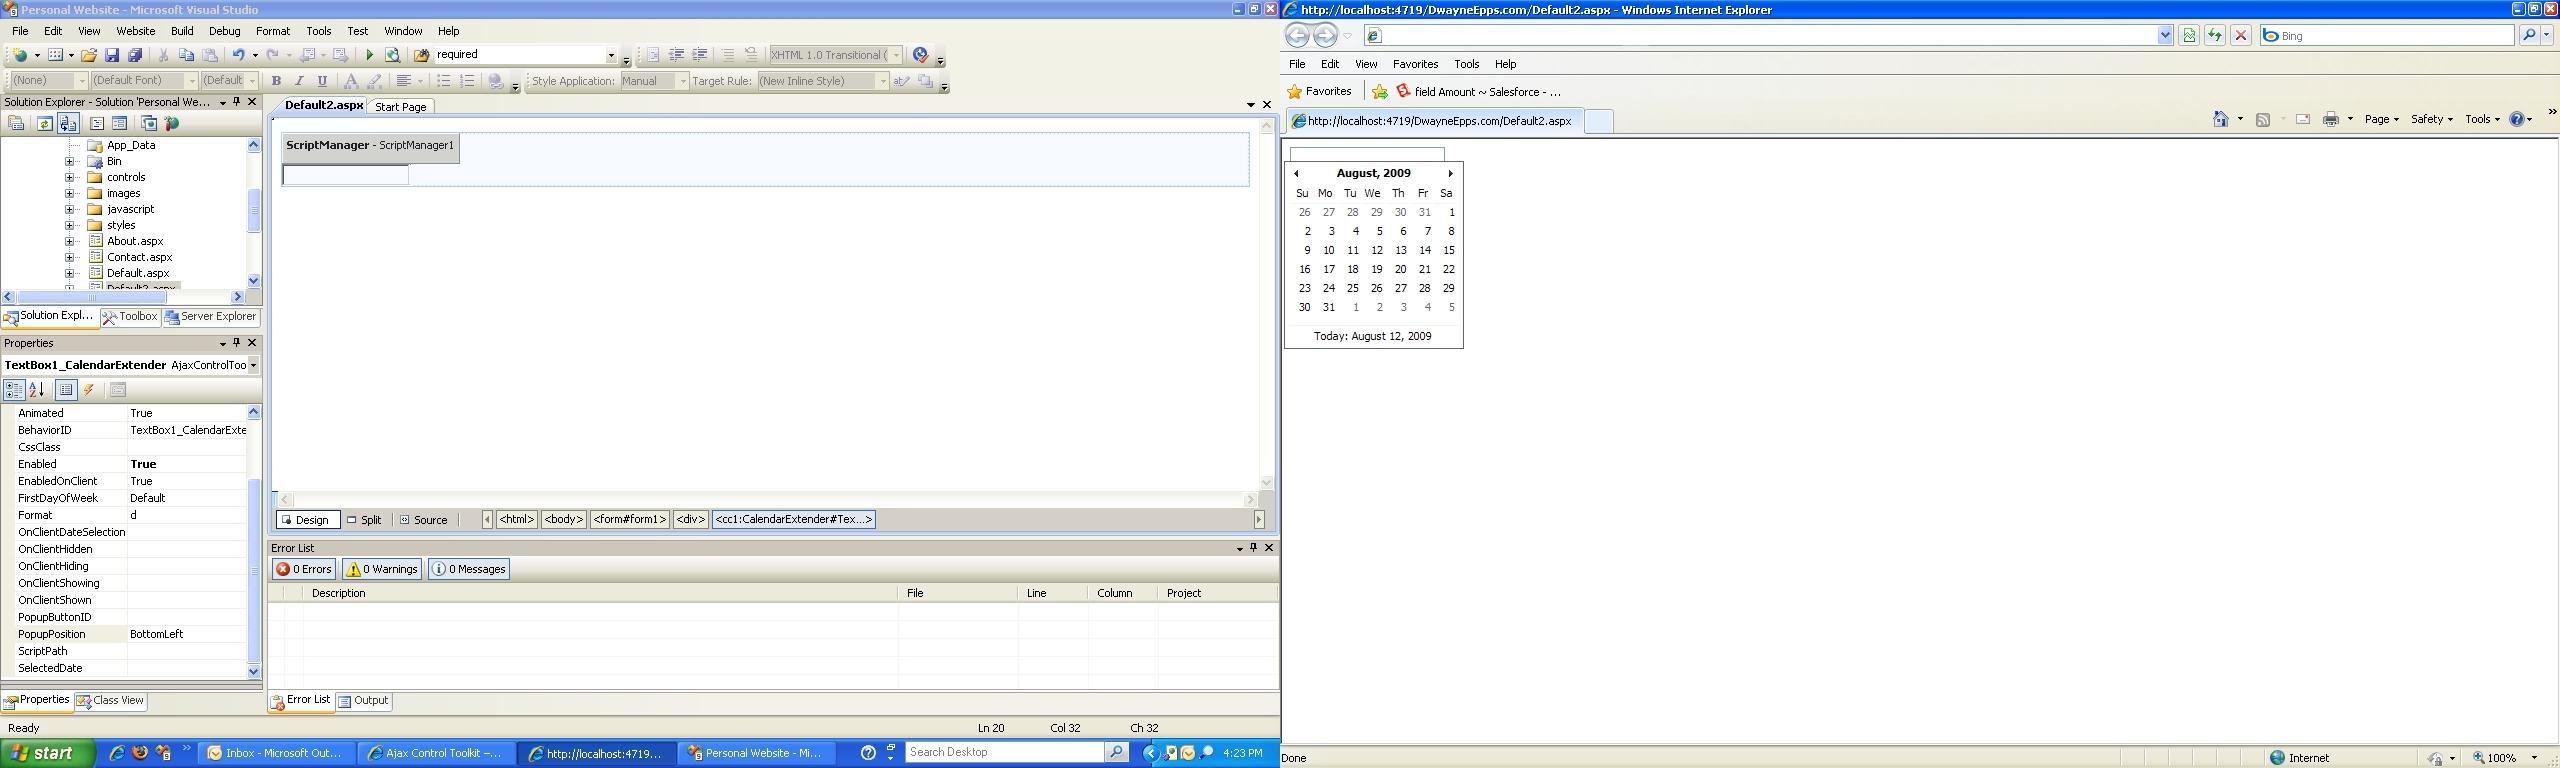 Dashing Ajax Calendar Extender Blank • Printable Blank Calendar Template_Ajax Calendar Extender Blank